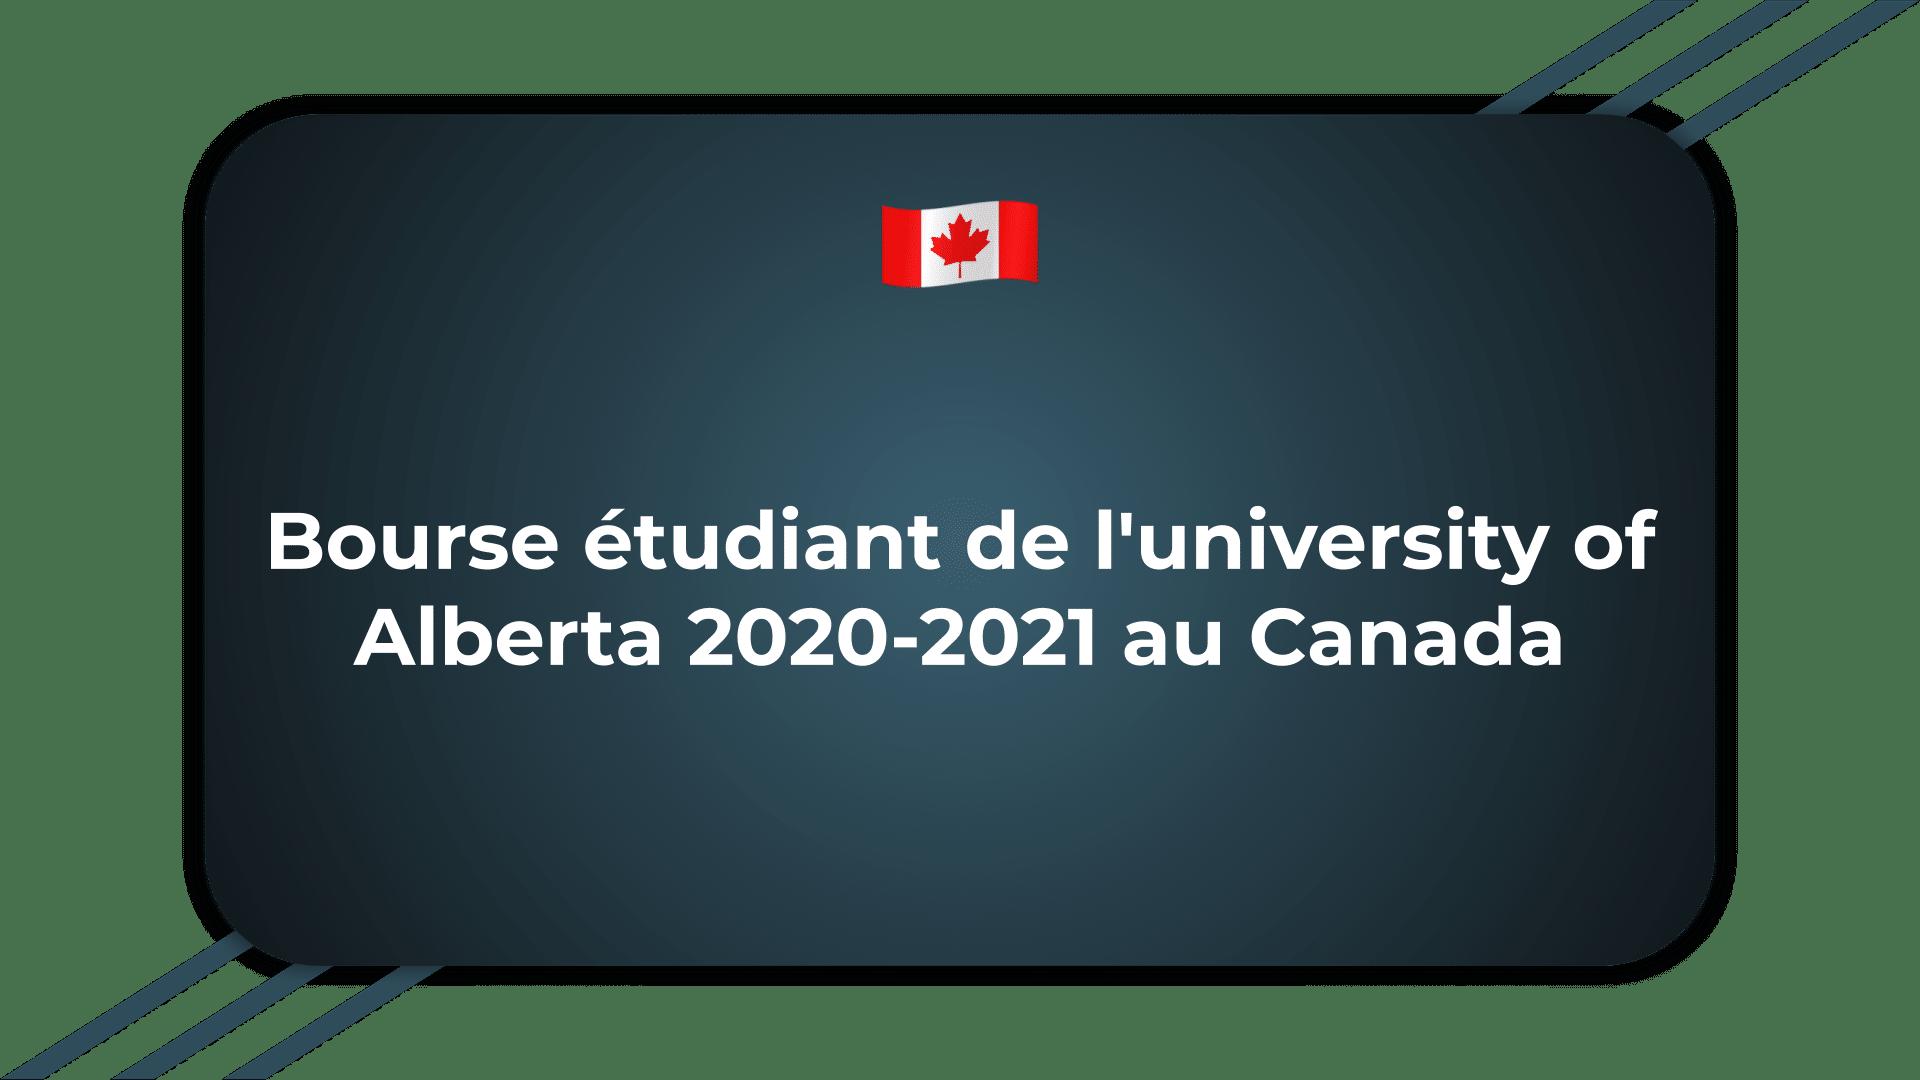 Bourse étudiant de l'university of Alberta